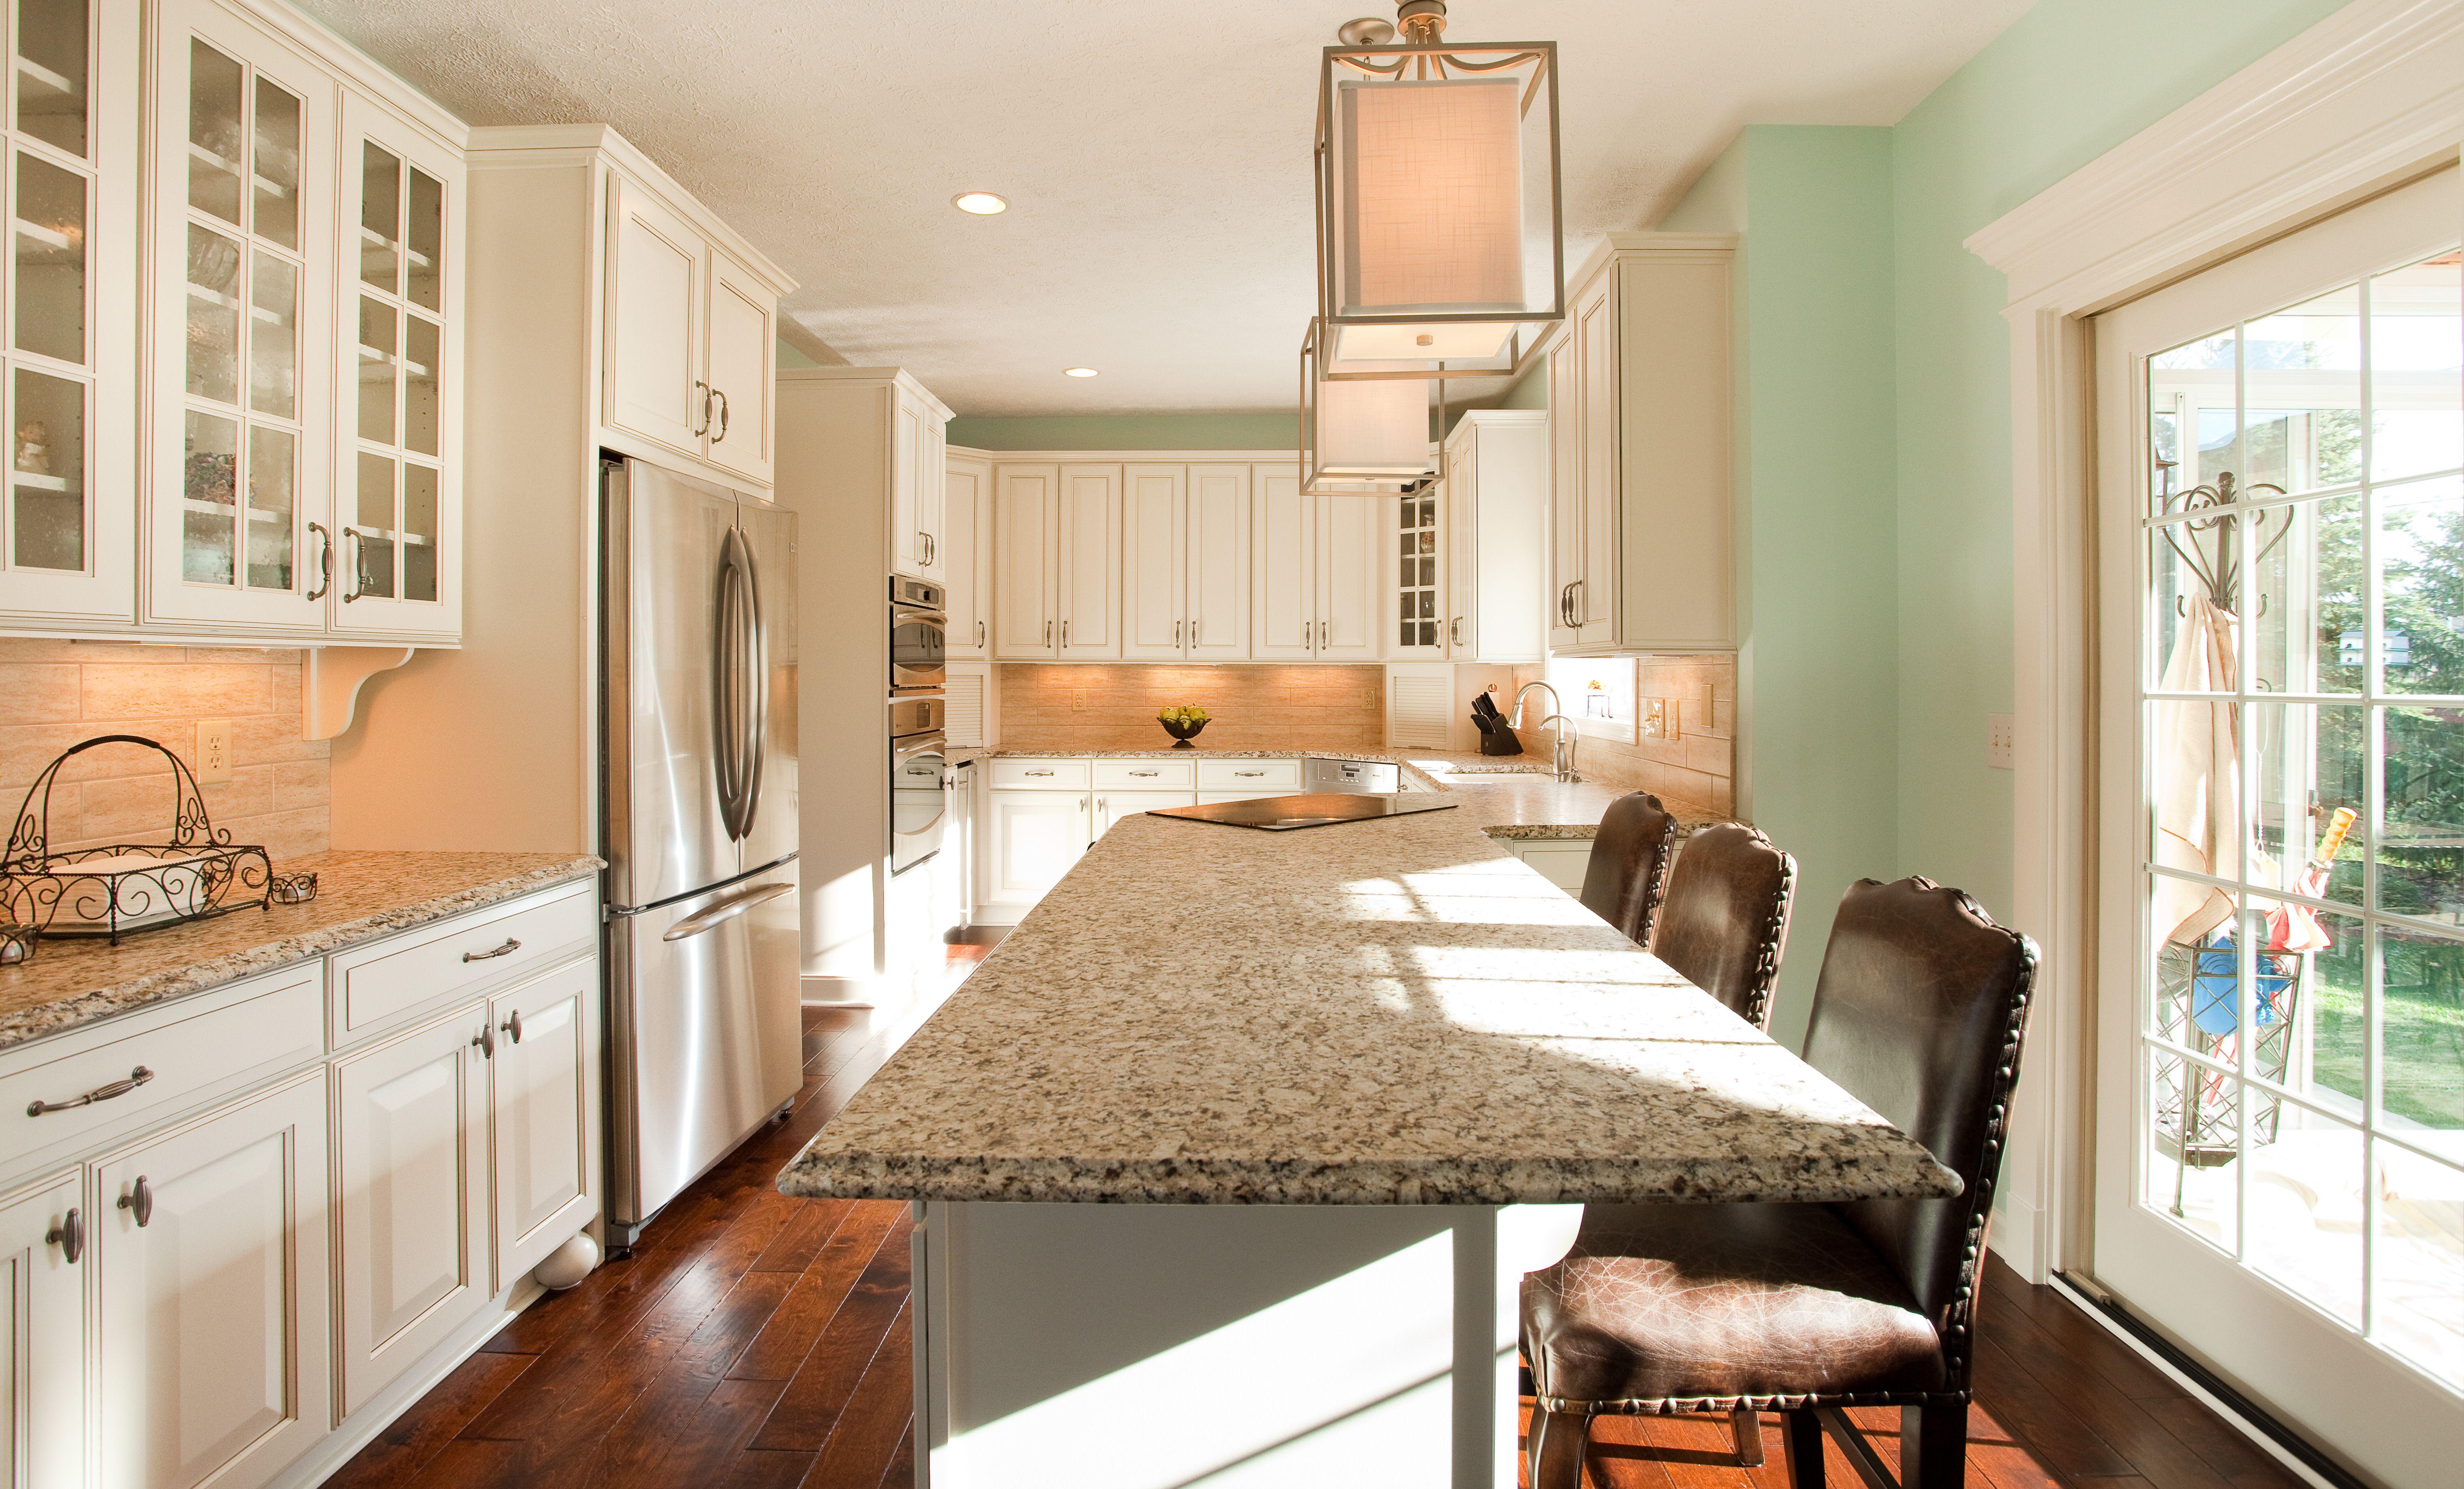 Long narrow kitchen design gallery - Narrow Kitchen Google Search Kitchen Imagessmall Kitchen Designssmall